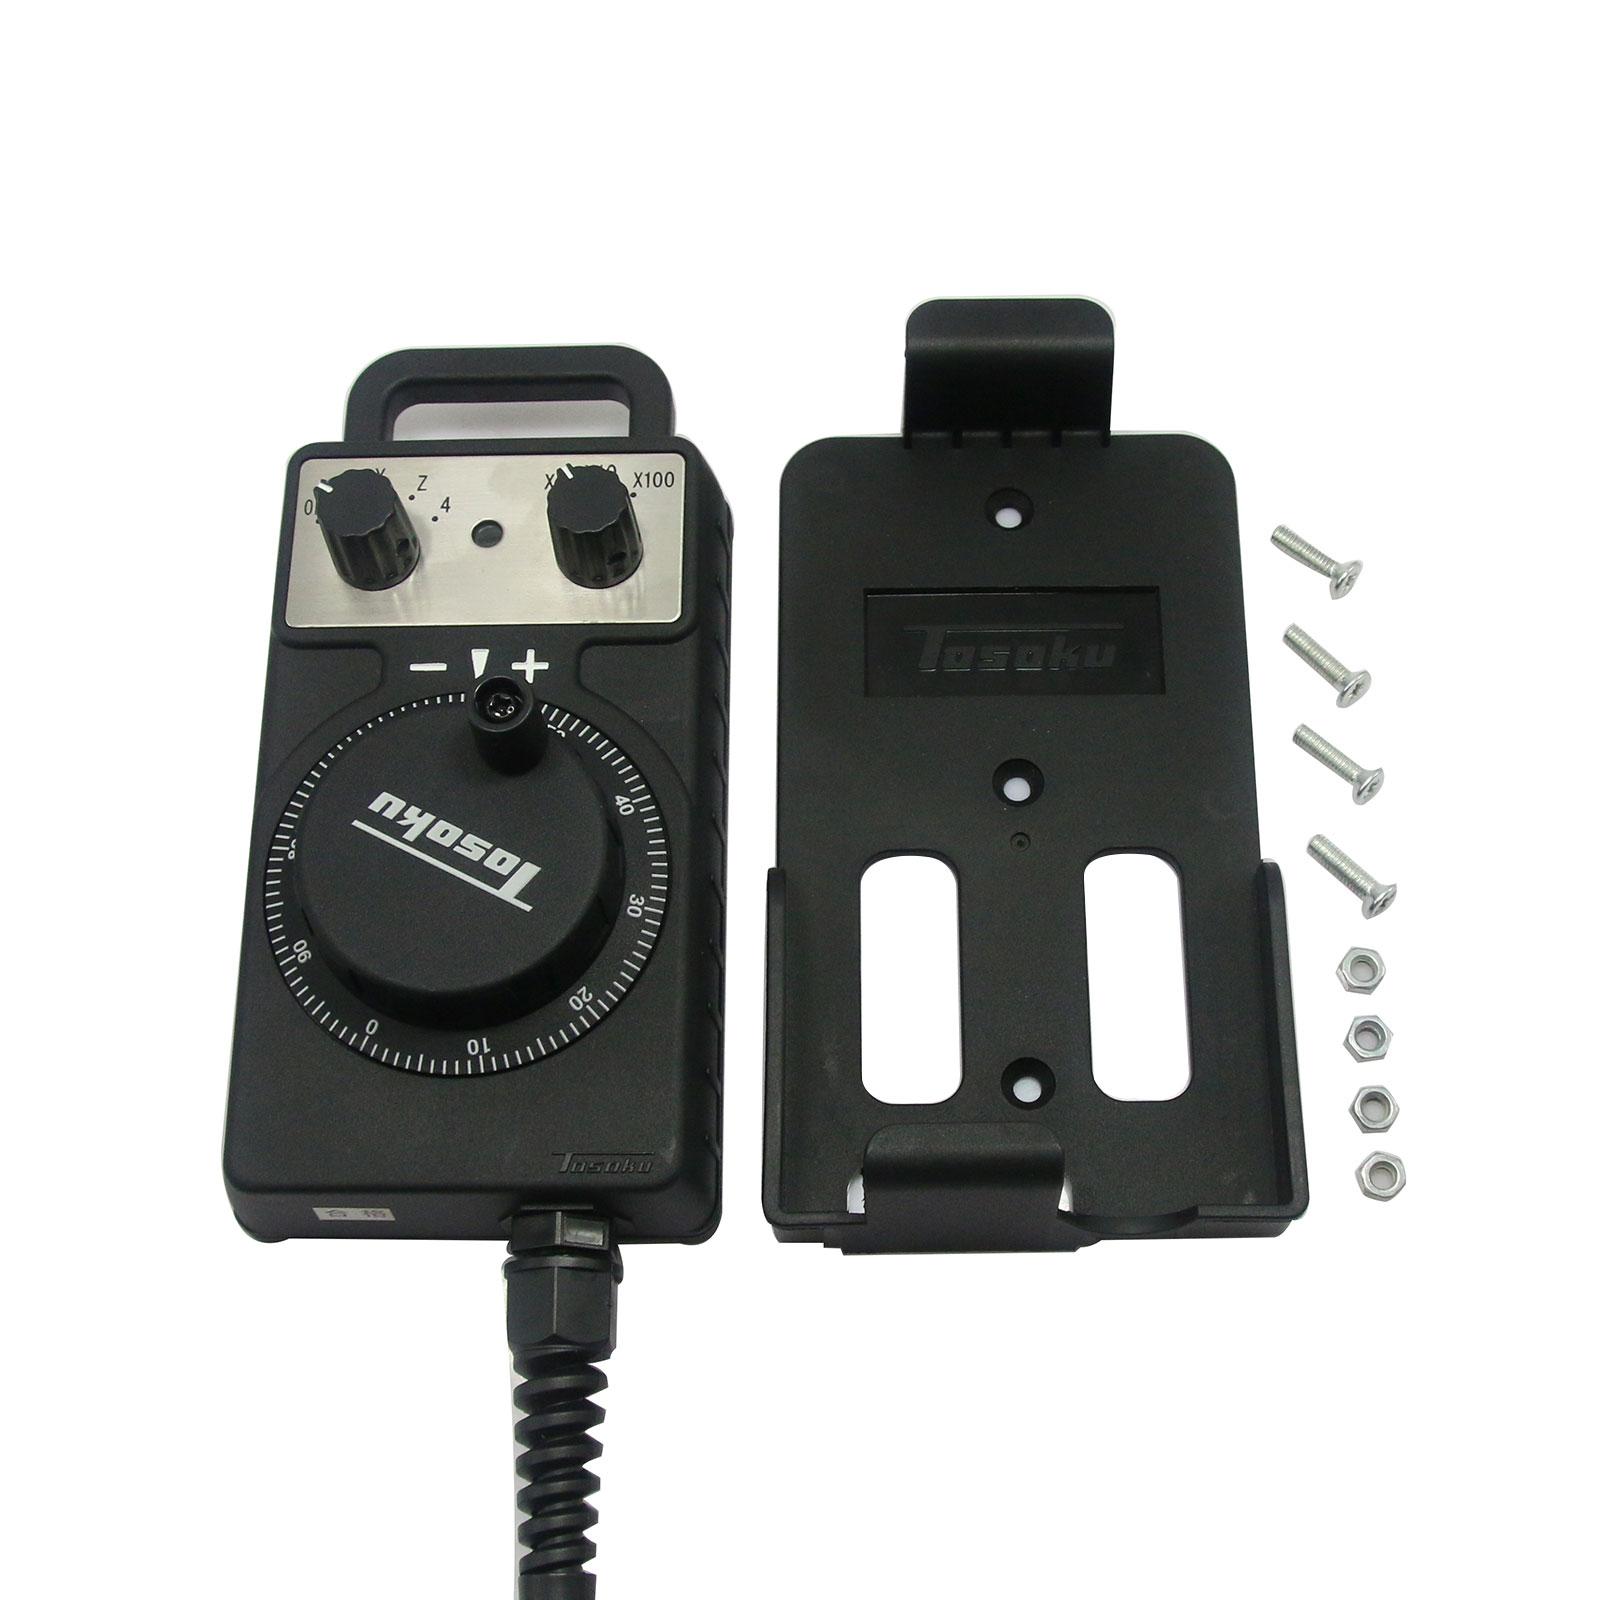 TOSOKU HC1 Series HC115 CNC Handwheel Handle Manual Pulse Generator for FANUC